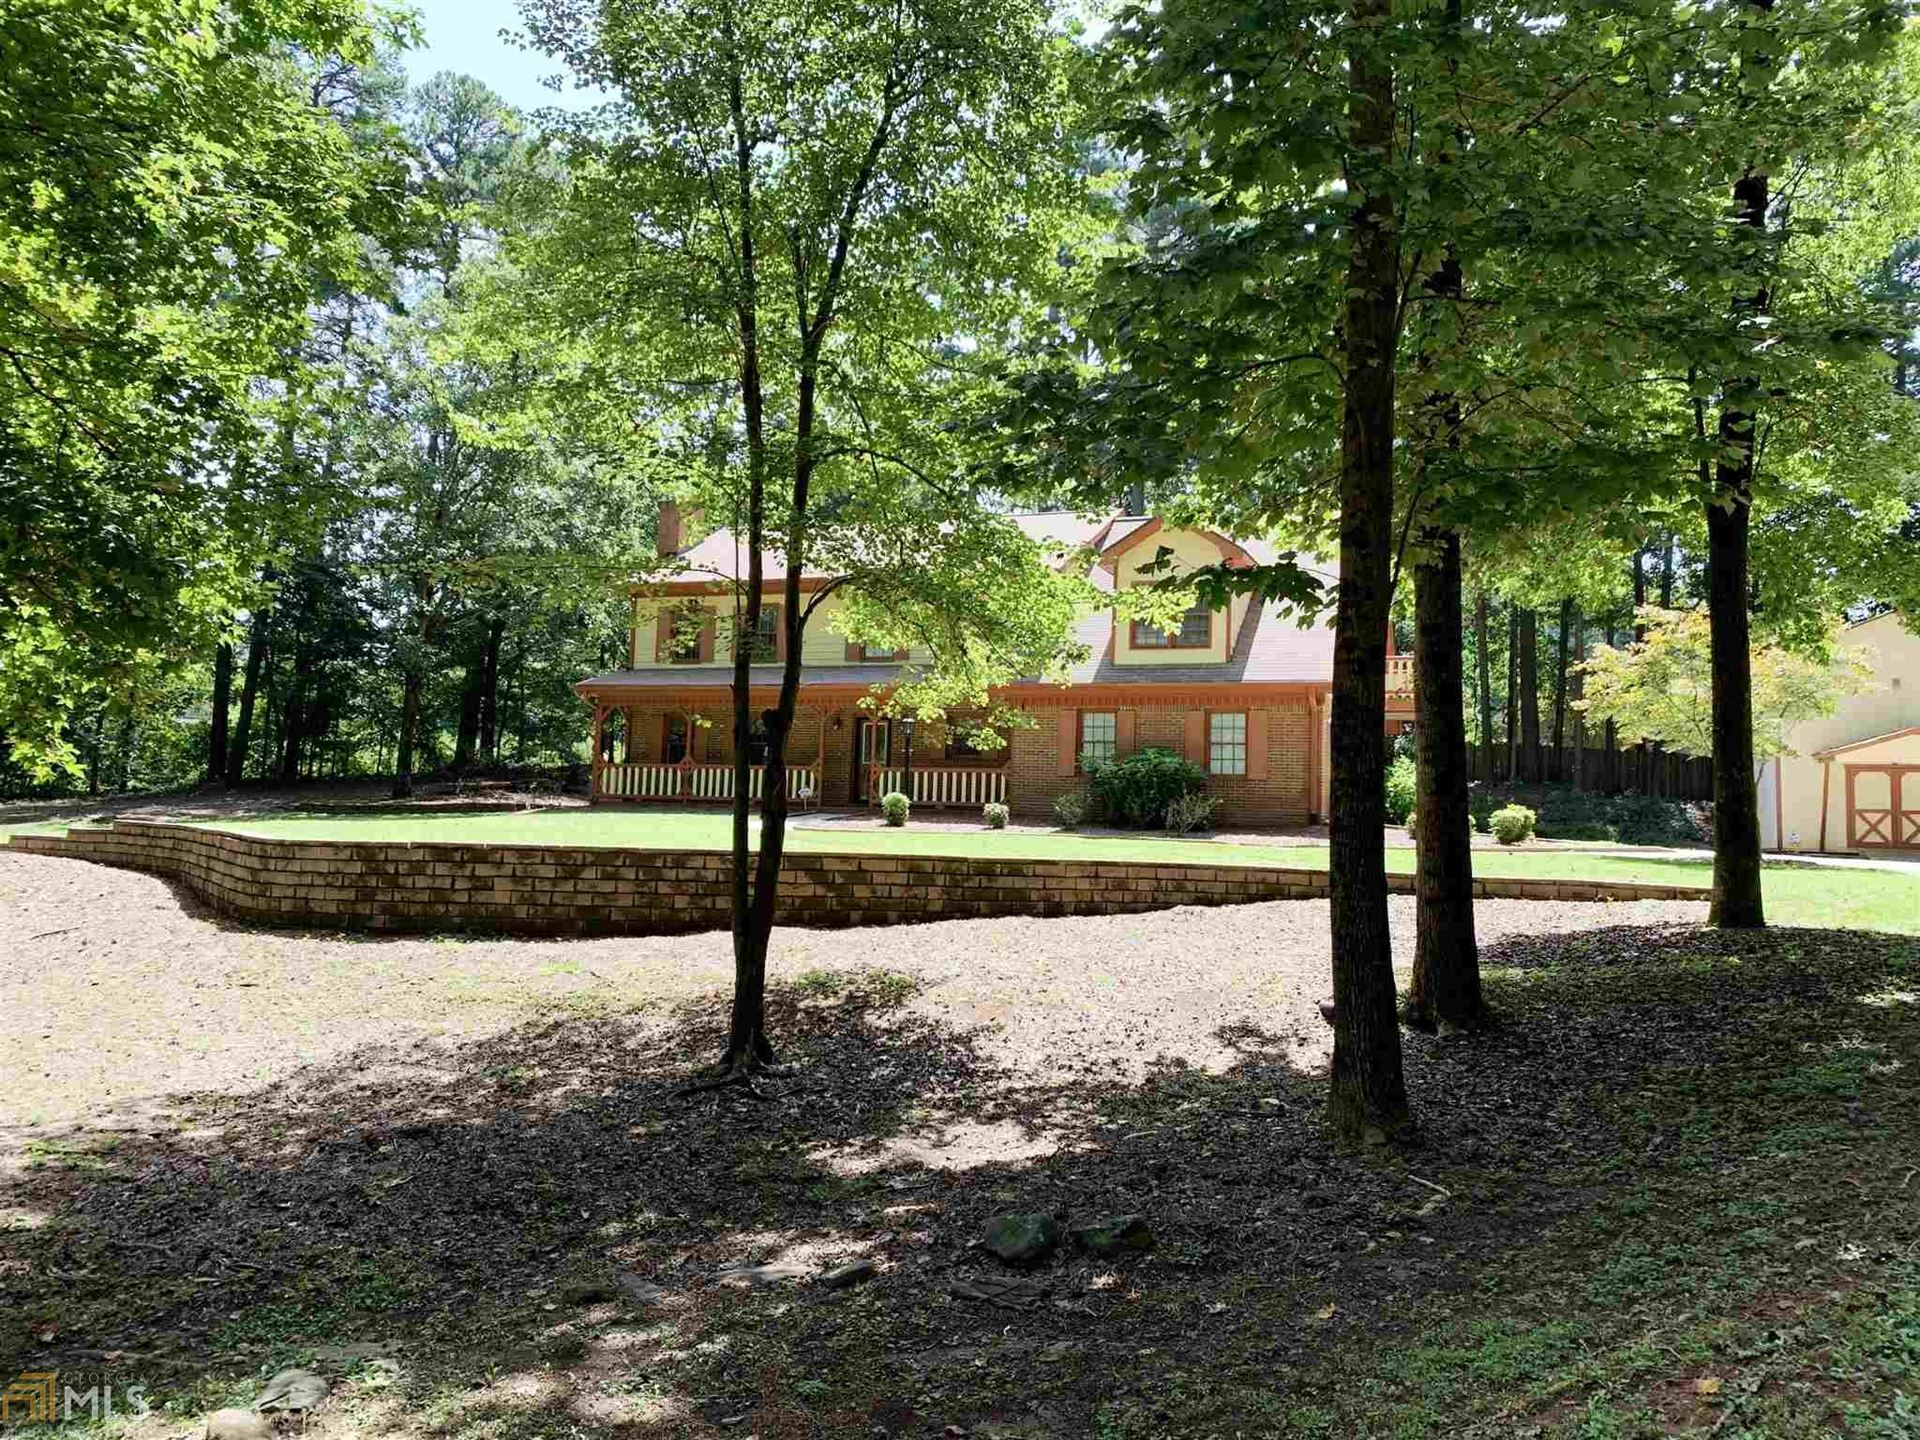 1604 Webb Gin House Rd, Snellville, GA 30078 - MLS#: 8847720